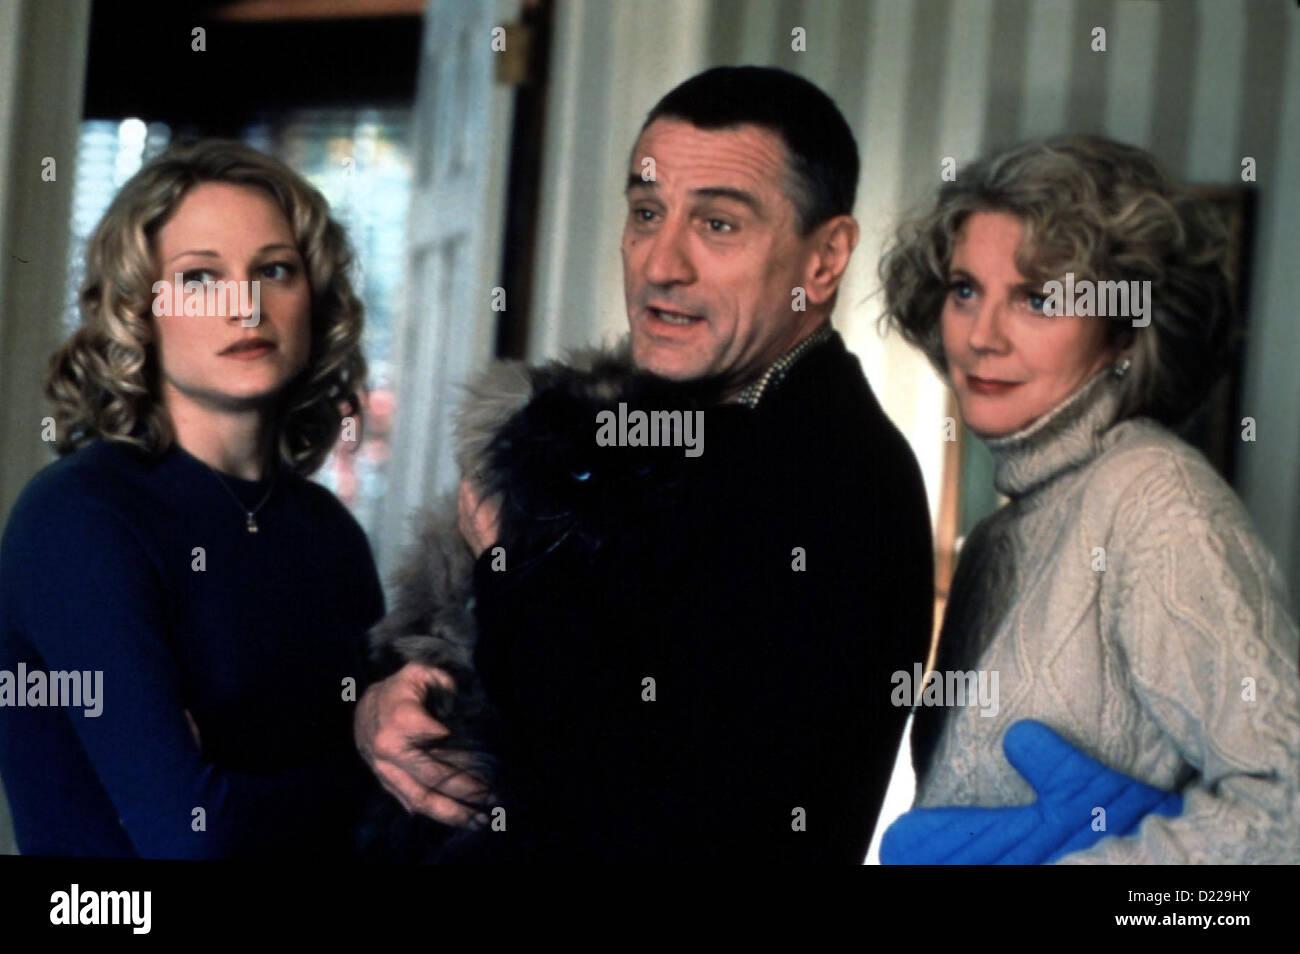 Meine Braut, Ihr Vater Und Ich  Meet Parents  Teri Polo, Robert De Niro, Blythe Danner Pam Byrnes (Teri Polo), Jack - Stock Image